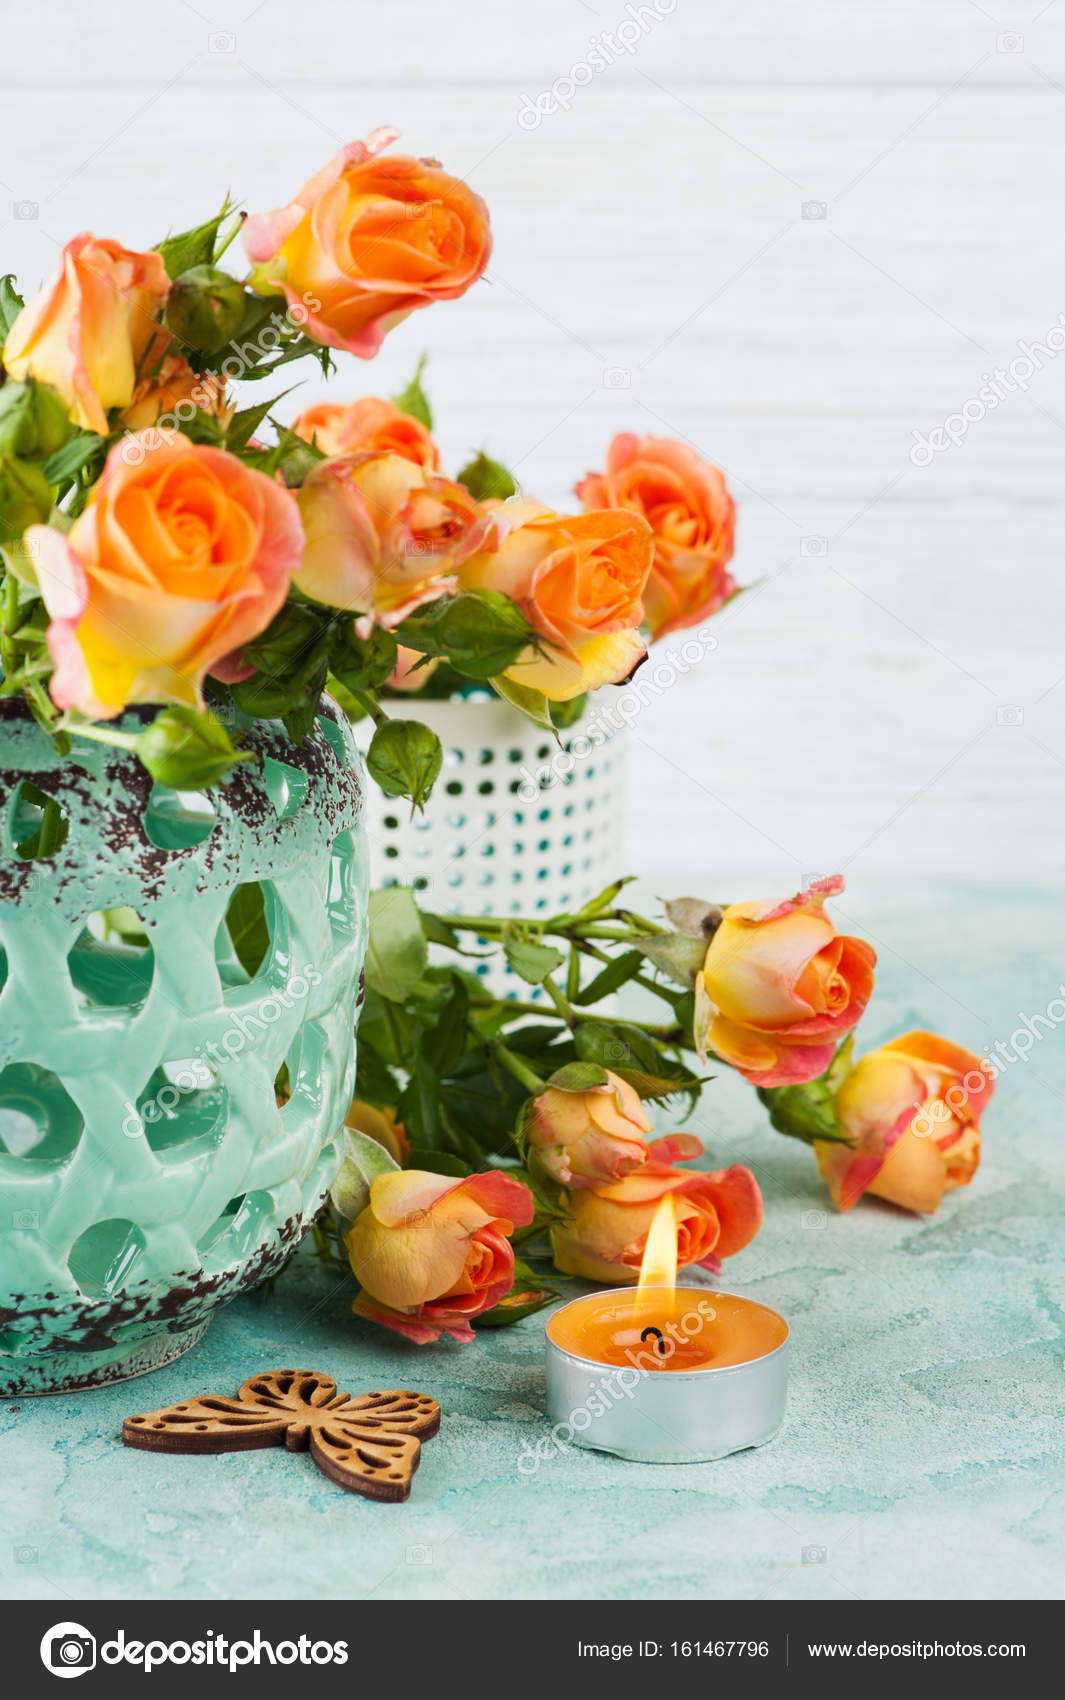 https://st3.depositphotos.com/3608211/16146/i/1600/depositphotos_161467796-stockafbeelding-fris-oranje-rozen-bloemen-in.jpg